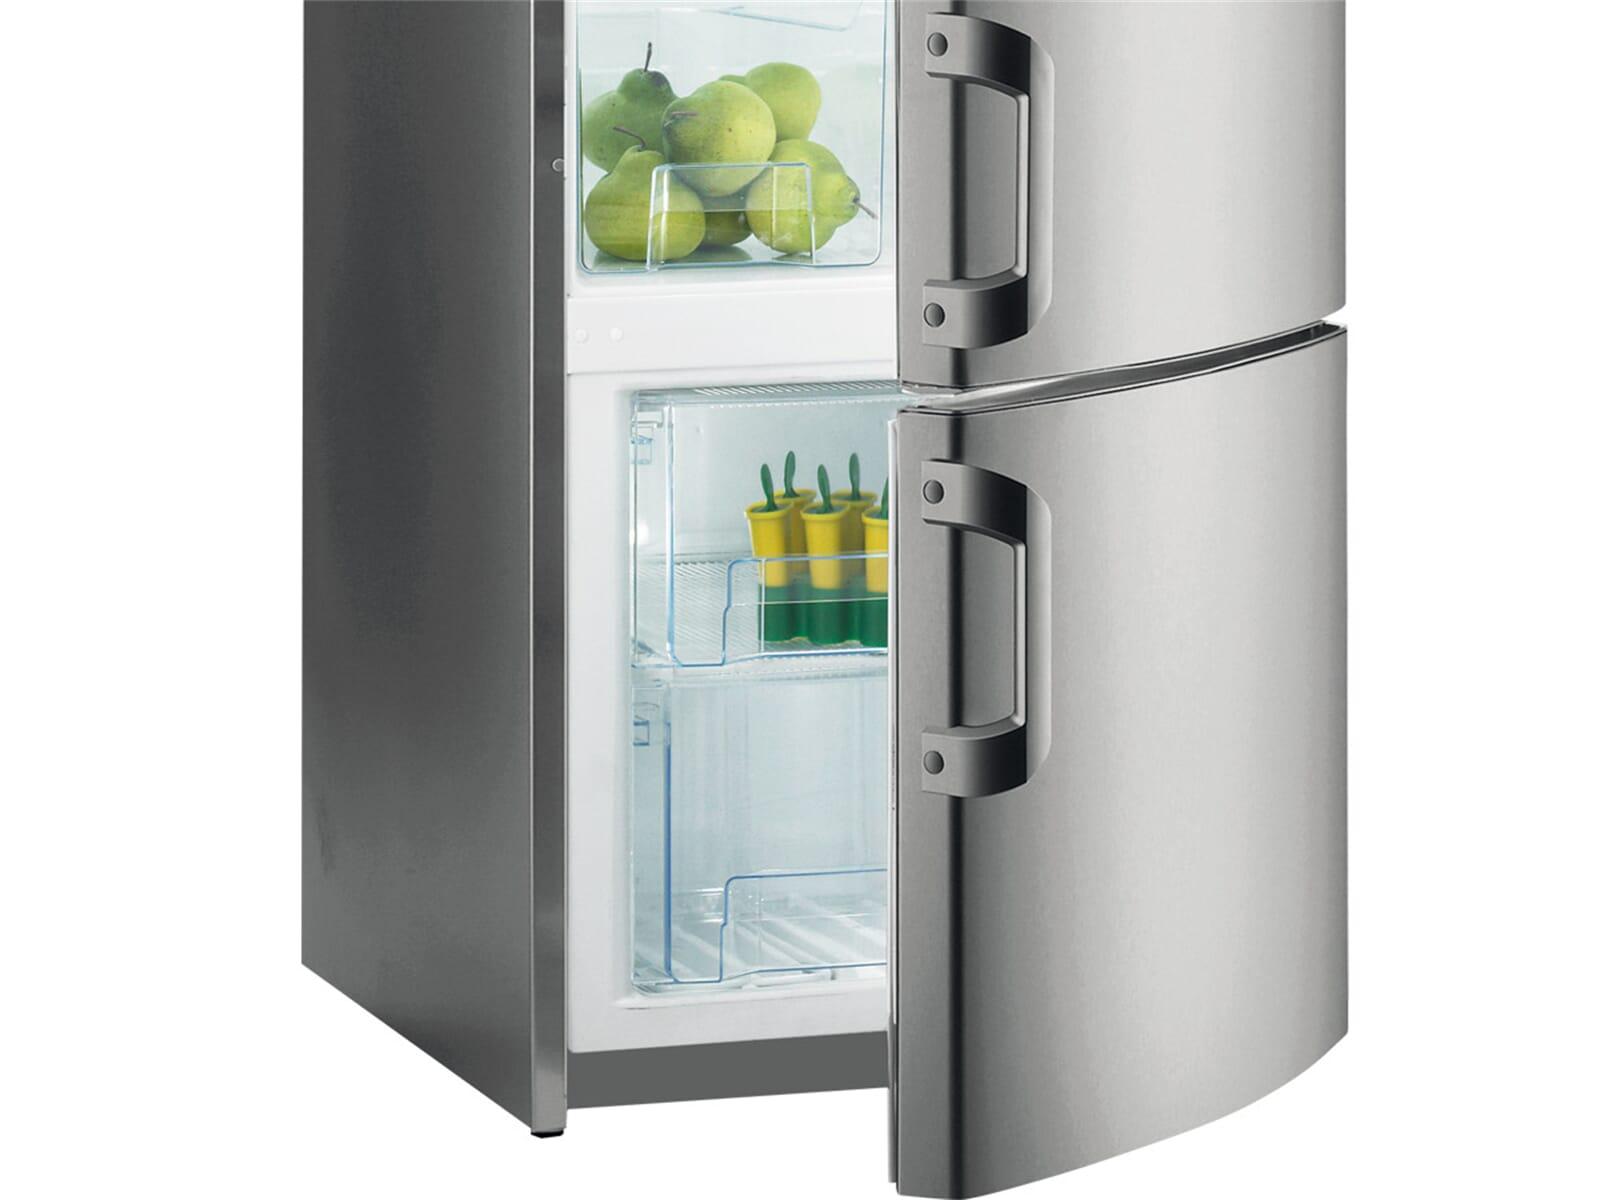 Gorenje Kühlschrank Rk 61620 X : Kühl gefrier kombi stand kühl gefrier kombination gorenje rk